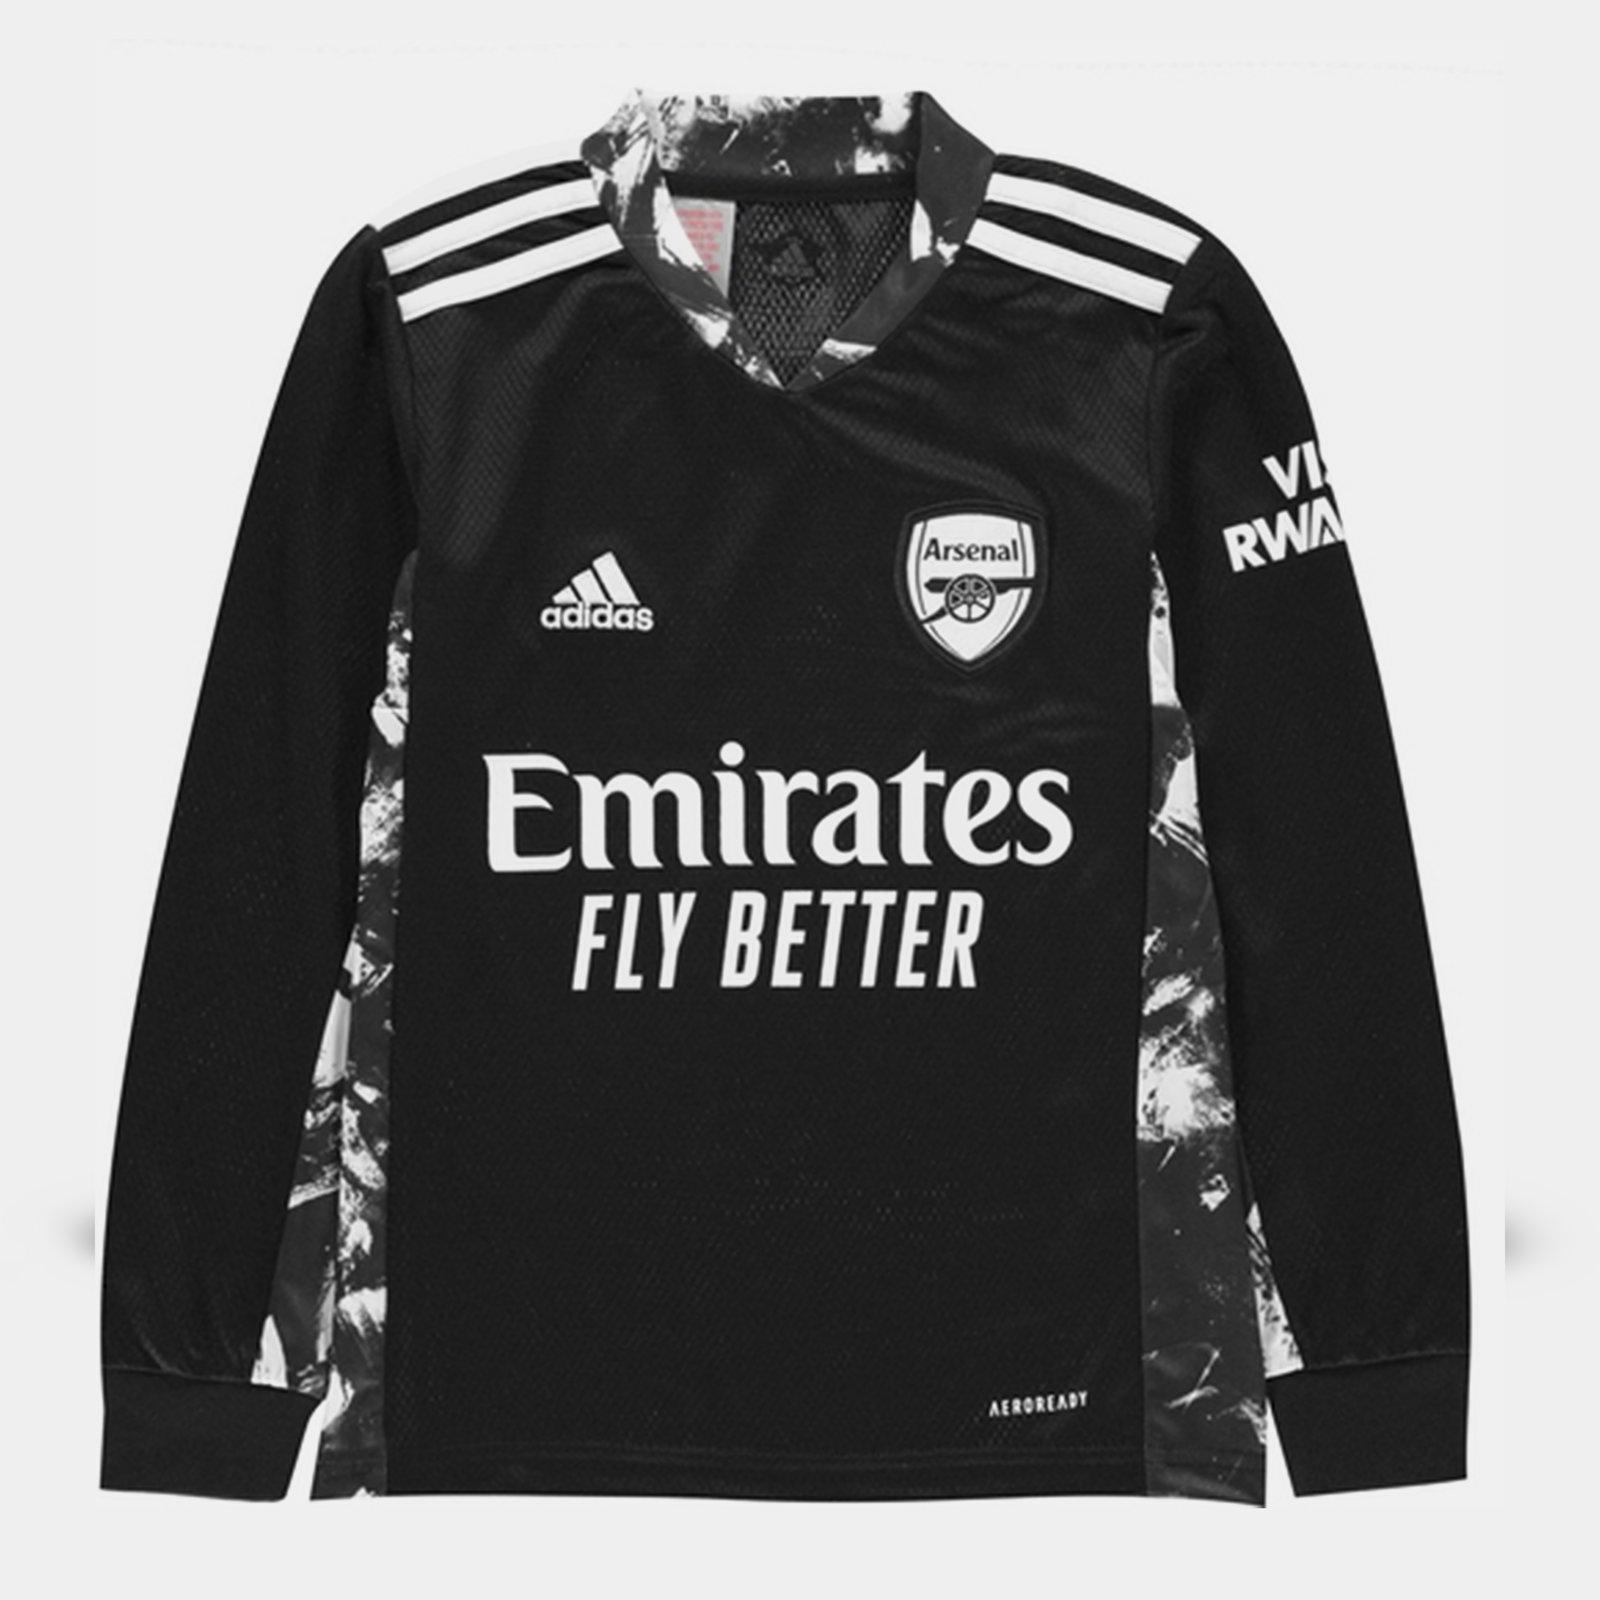 Arsenal Goalkeeper shirt